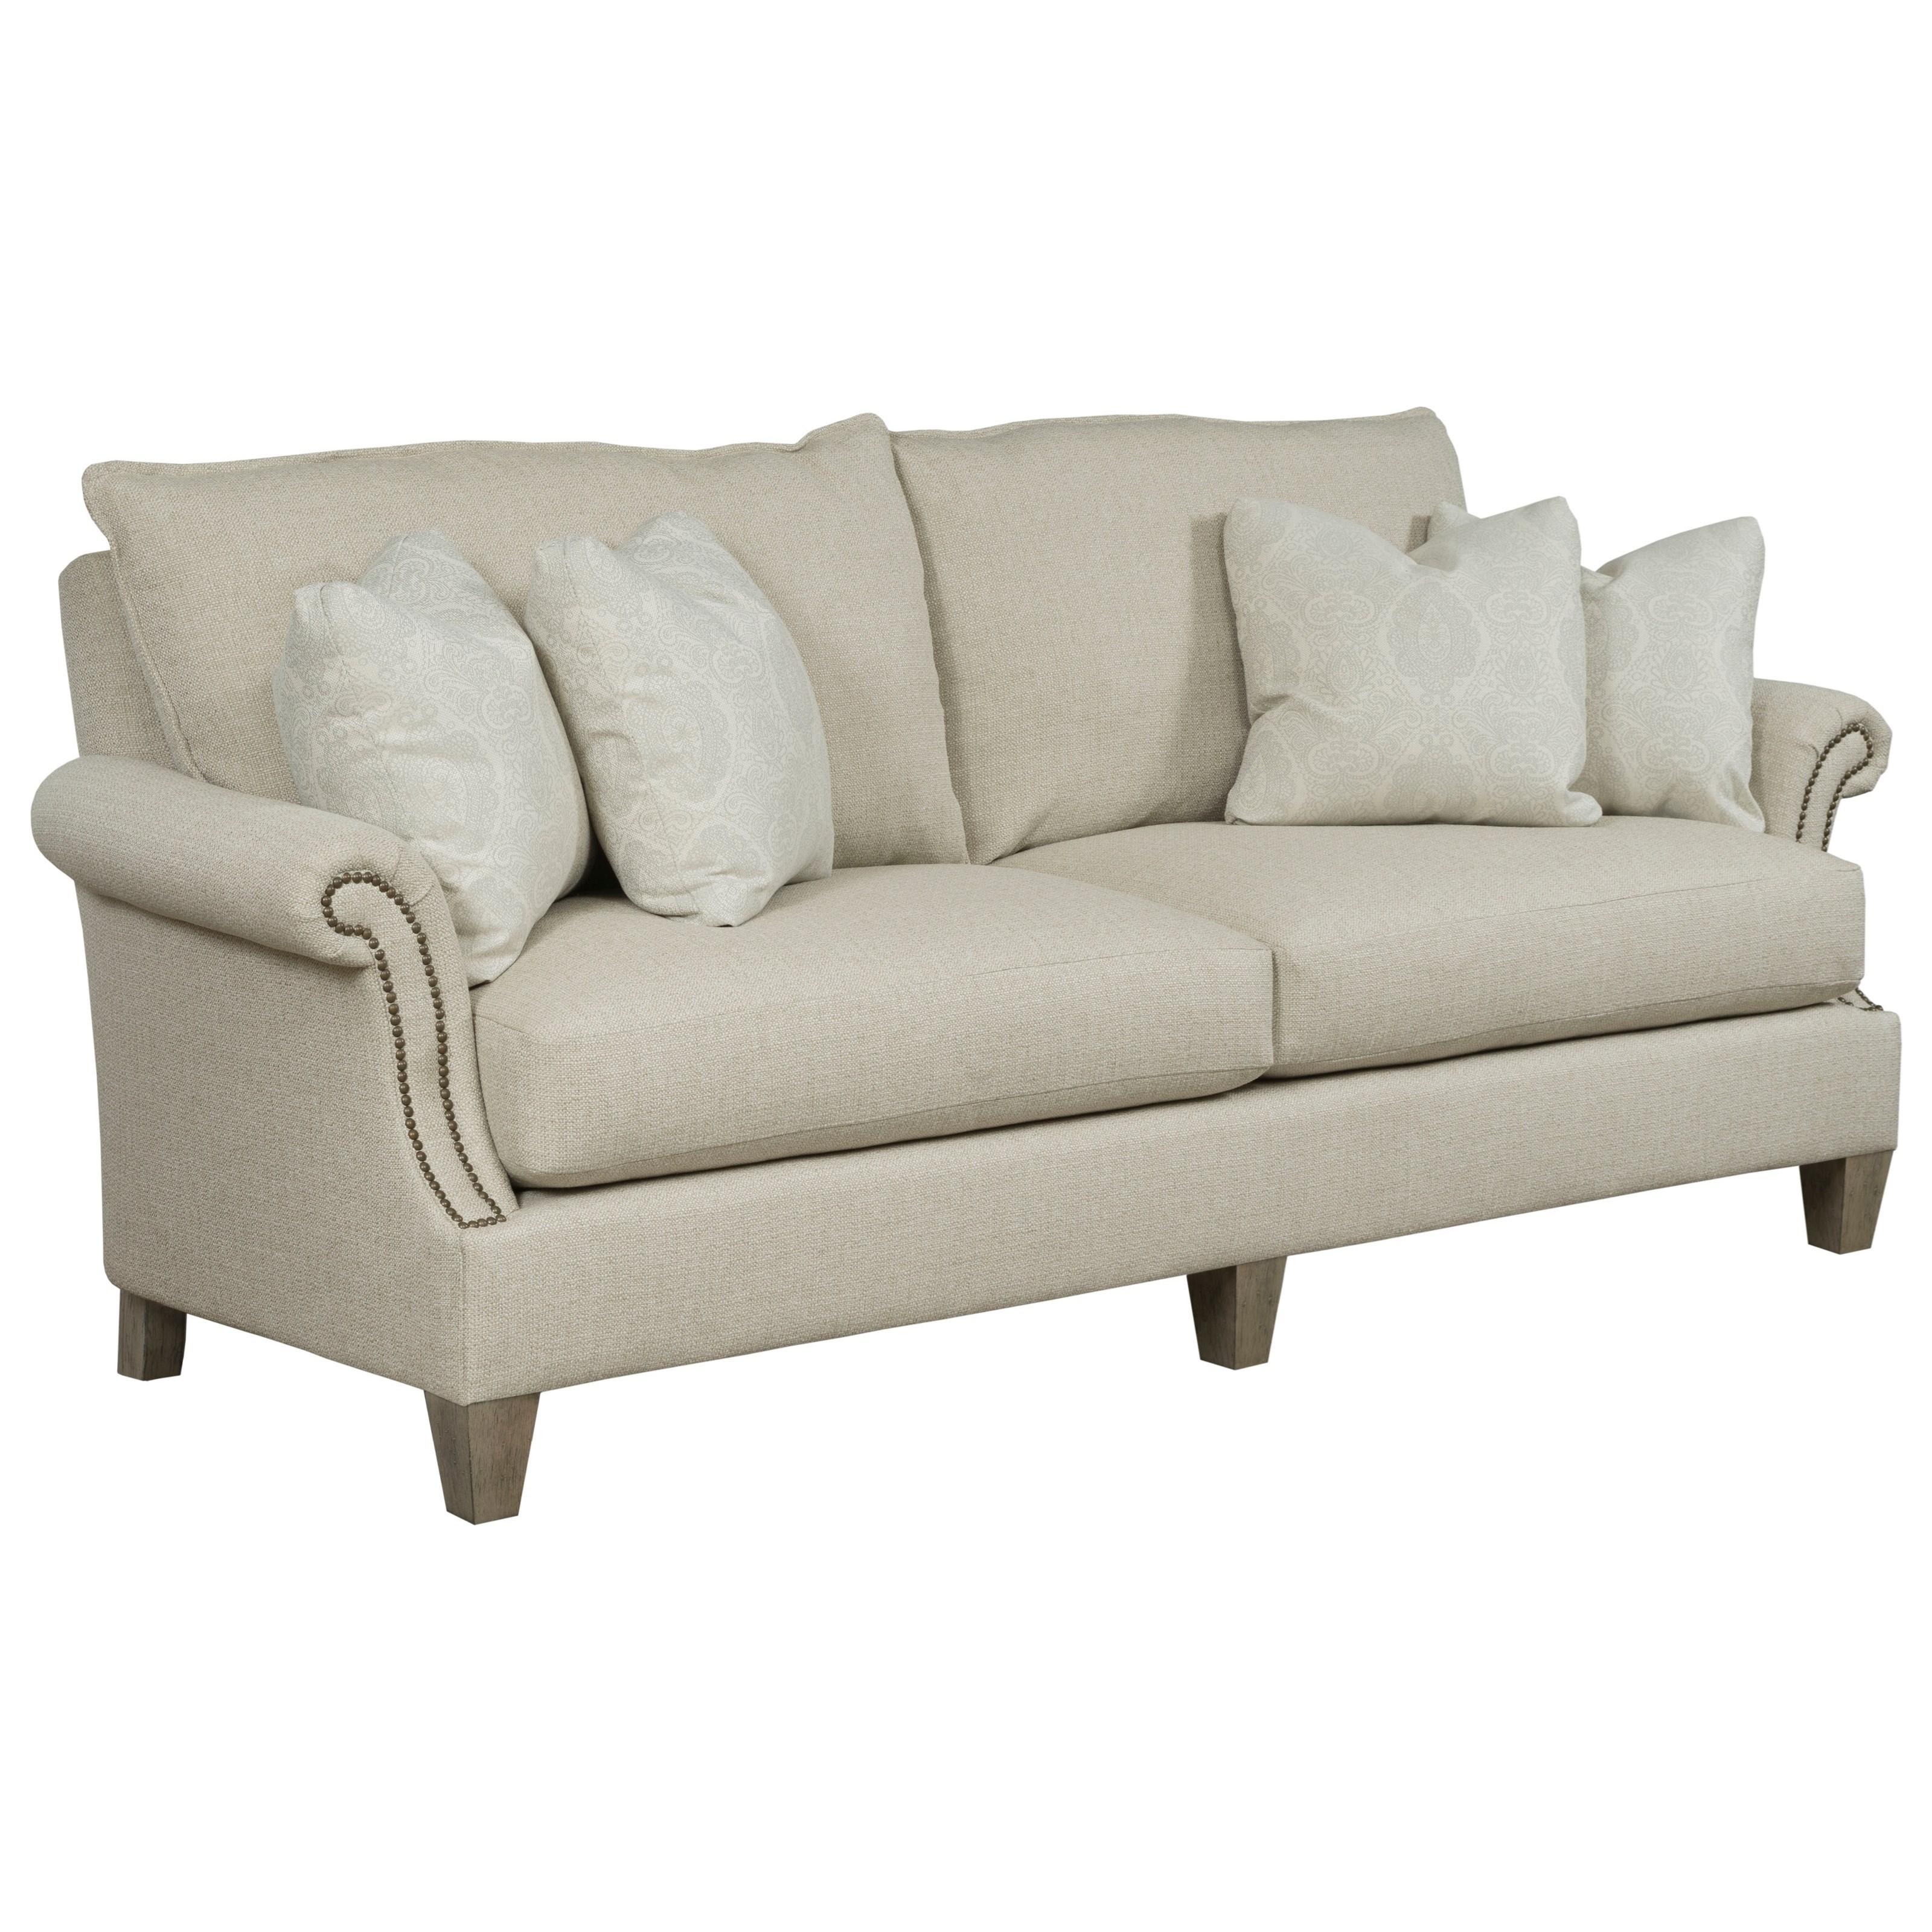 Greyson Large Sofa by Kincaid Furniture at Johnny Janosik